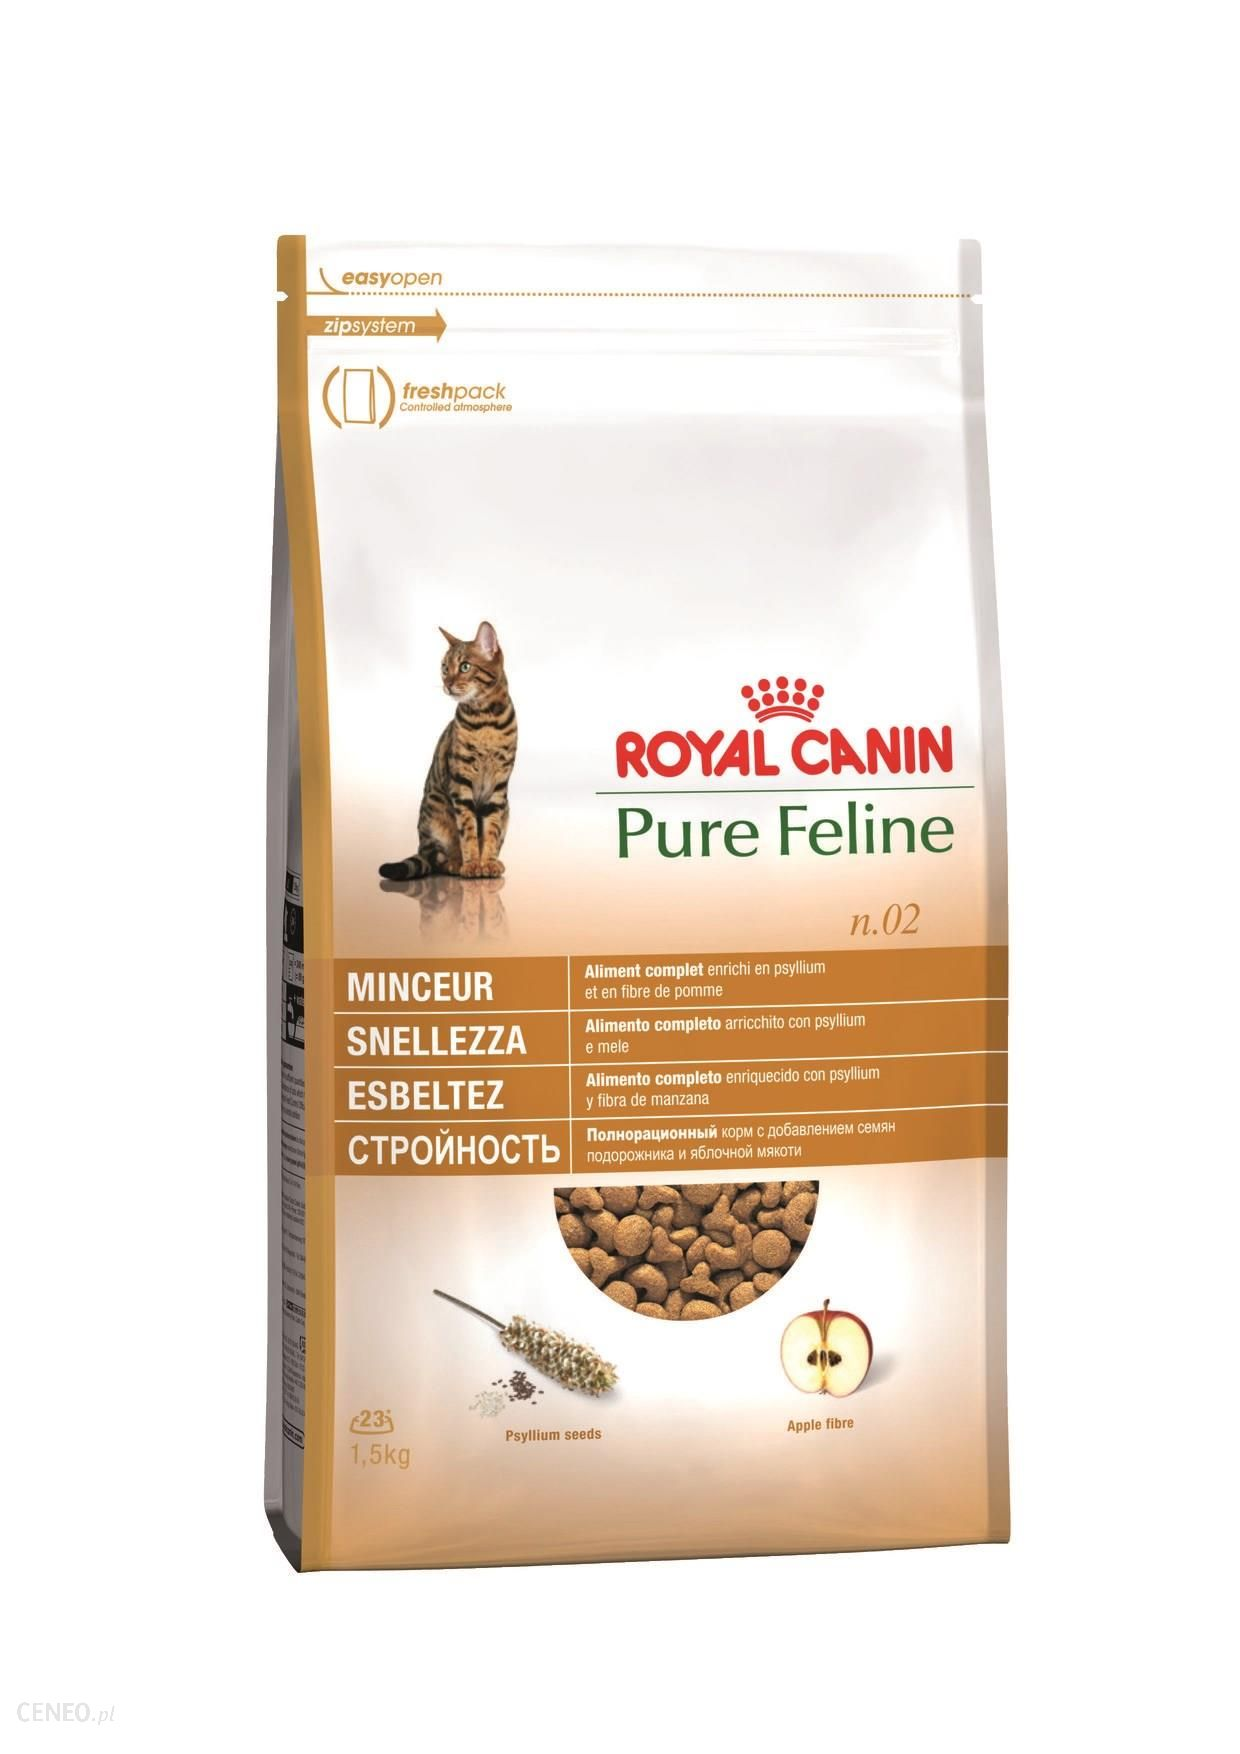 Royal Canin Pure Feline N.02 Slimness 300g